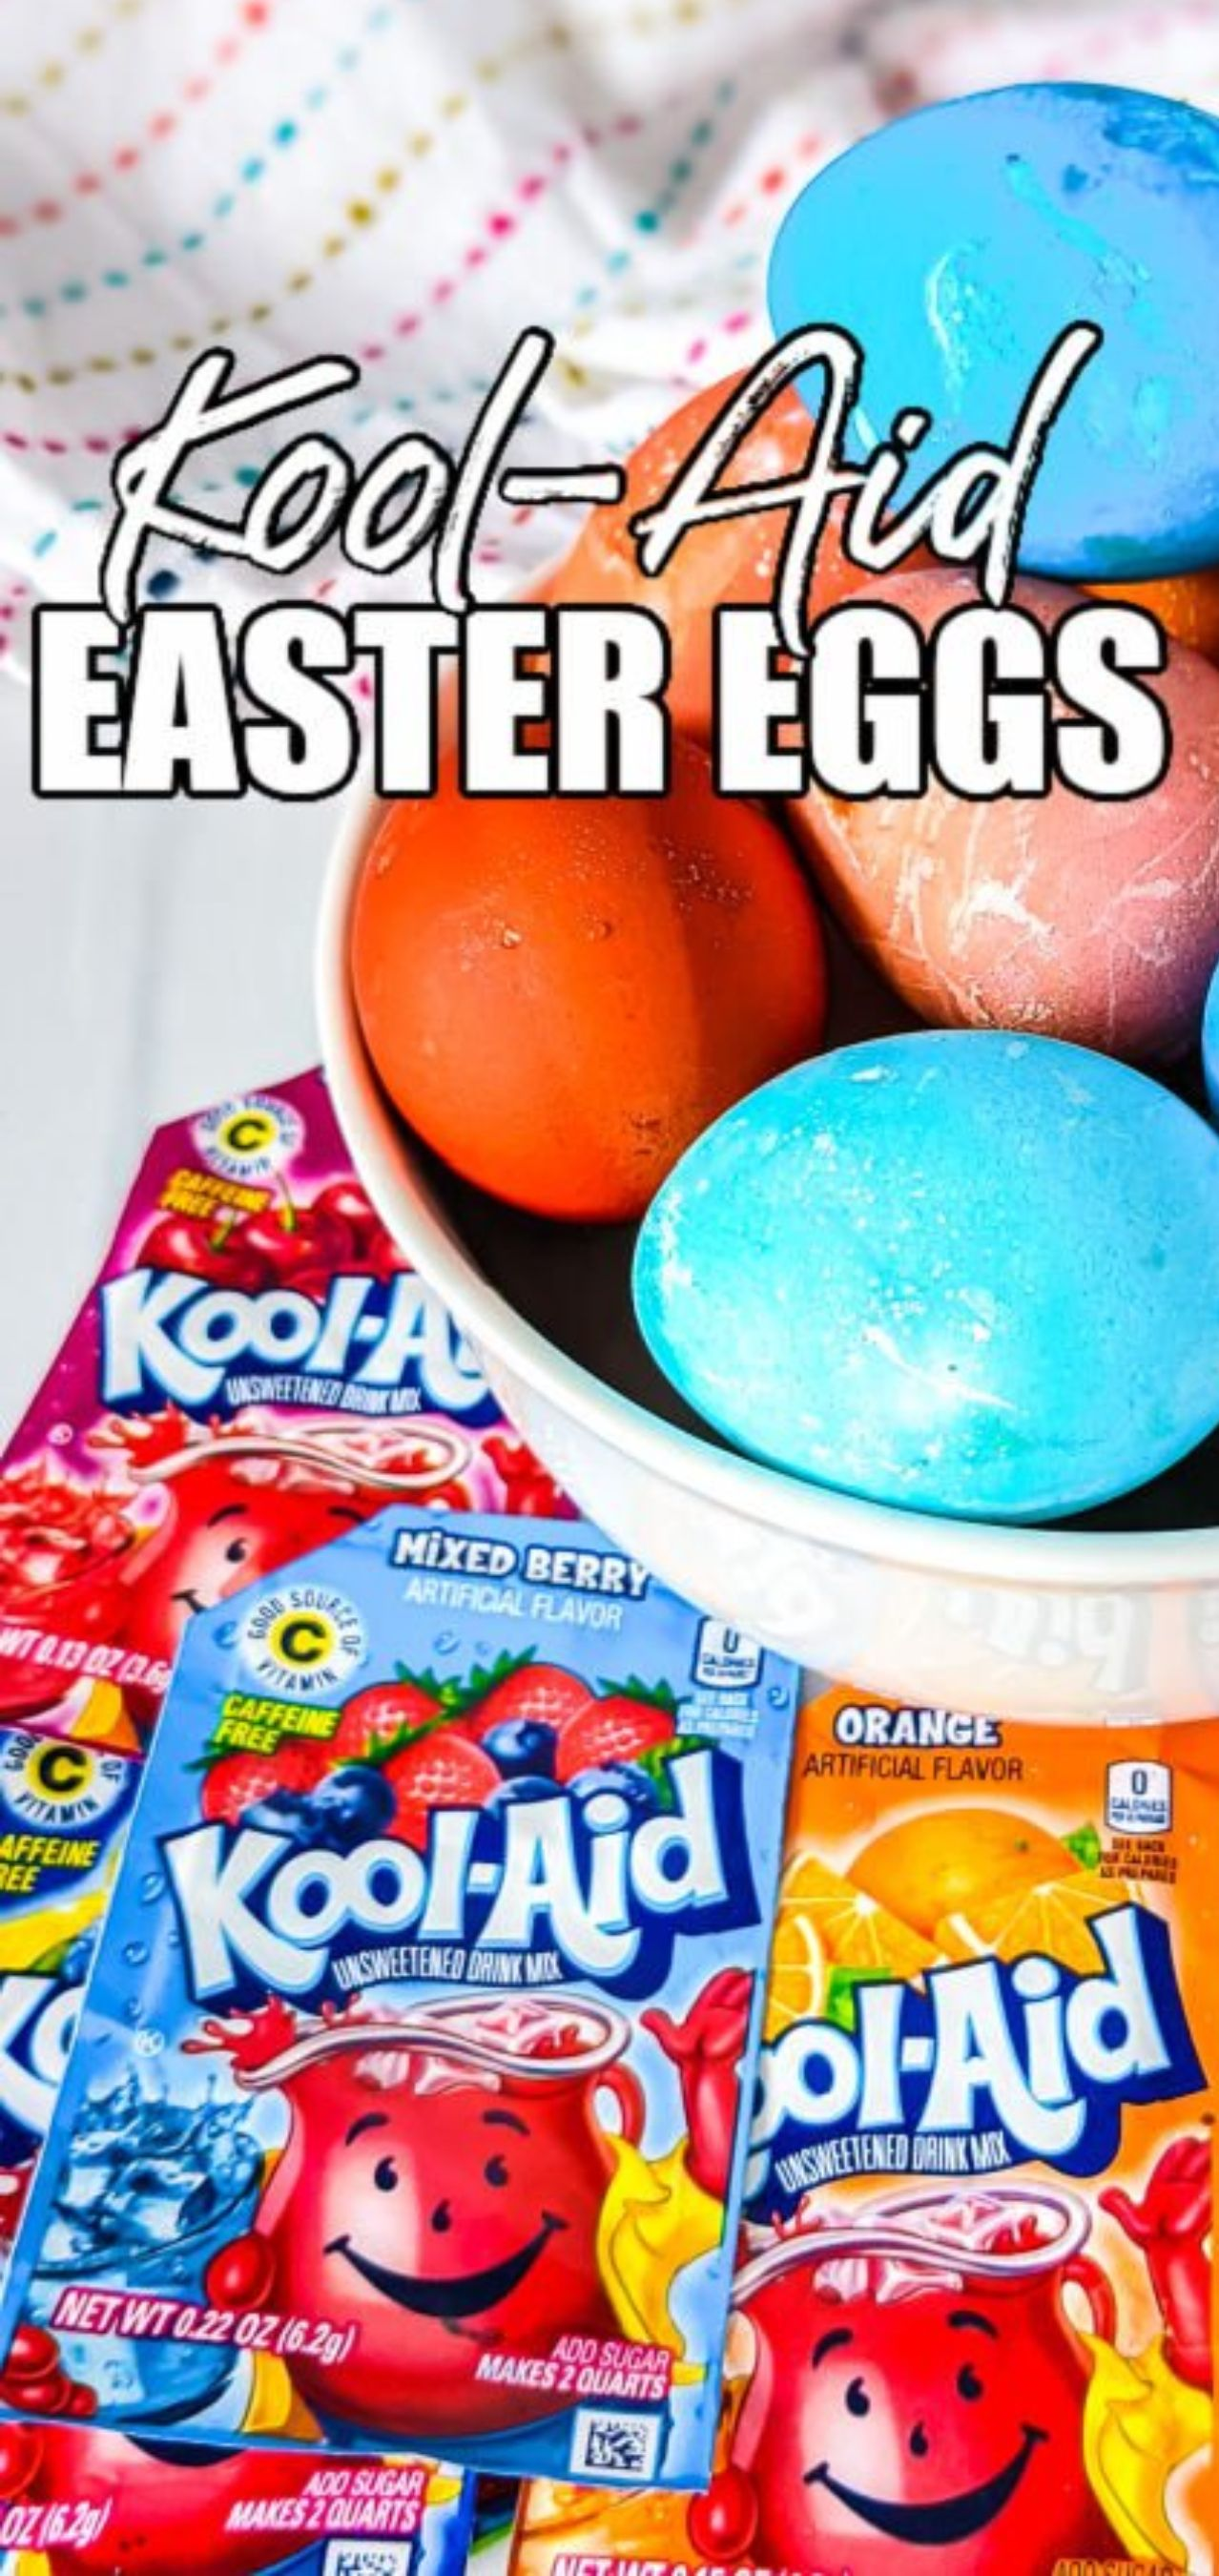 How To Dye Easter Eggs With Kool Aid In 2021 Kool Aid Easter Eggs Easter Egg Dye